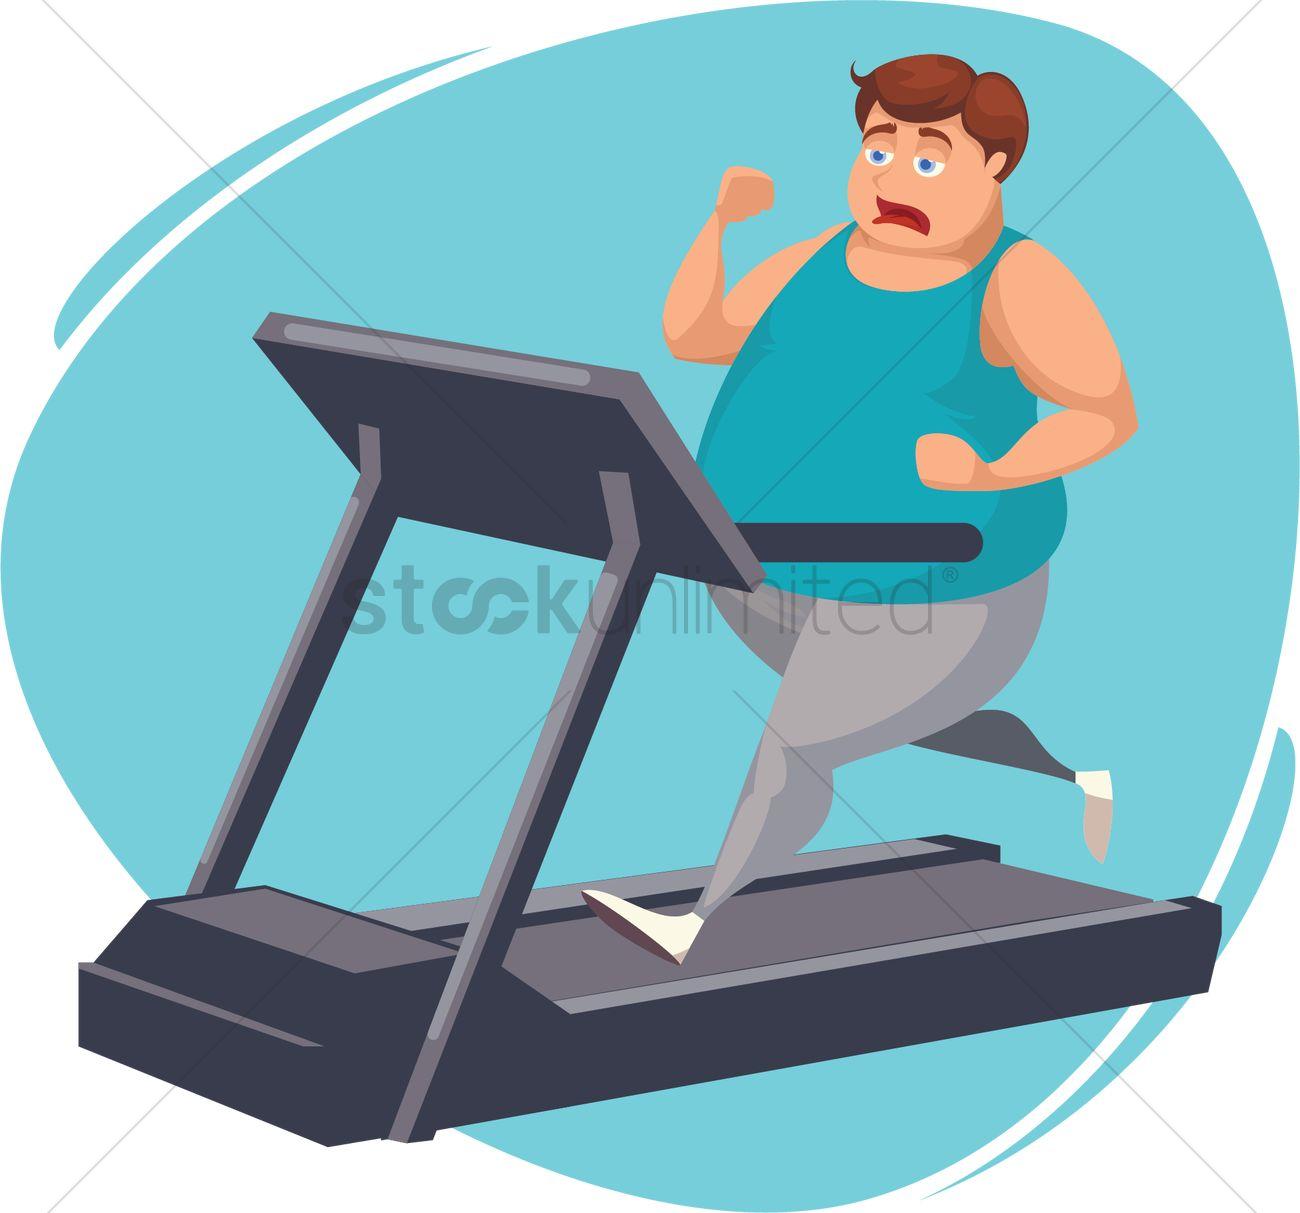 Walk on treadmill clipart svg free download Fat man running on treadmill Vector Image - 2021157 ... svg free download